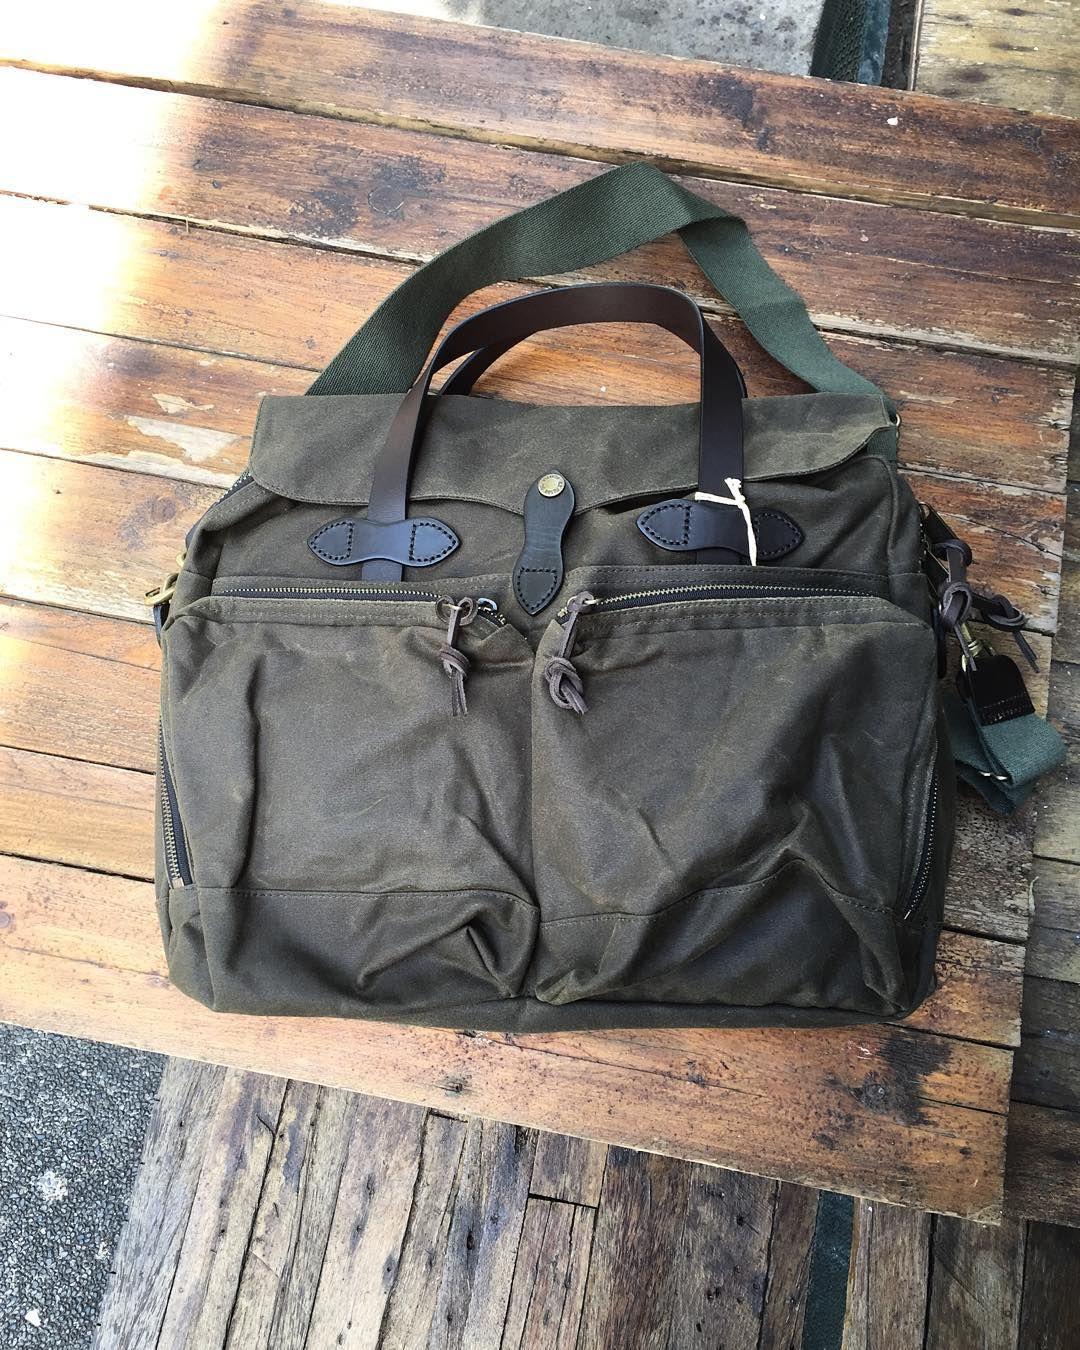 Angelobrycesalhab On Instagram The Filson 24 Hour Tin Cloth Briefcase Filsonlife Filsonbag Bagsforlife Filson Bags Filson Backpack Travel Bag